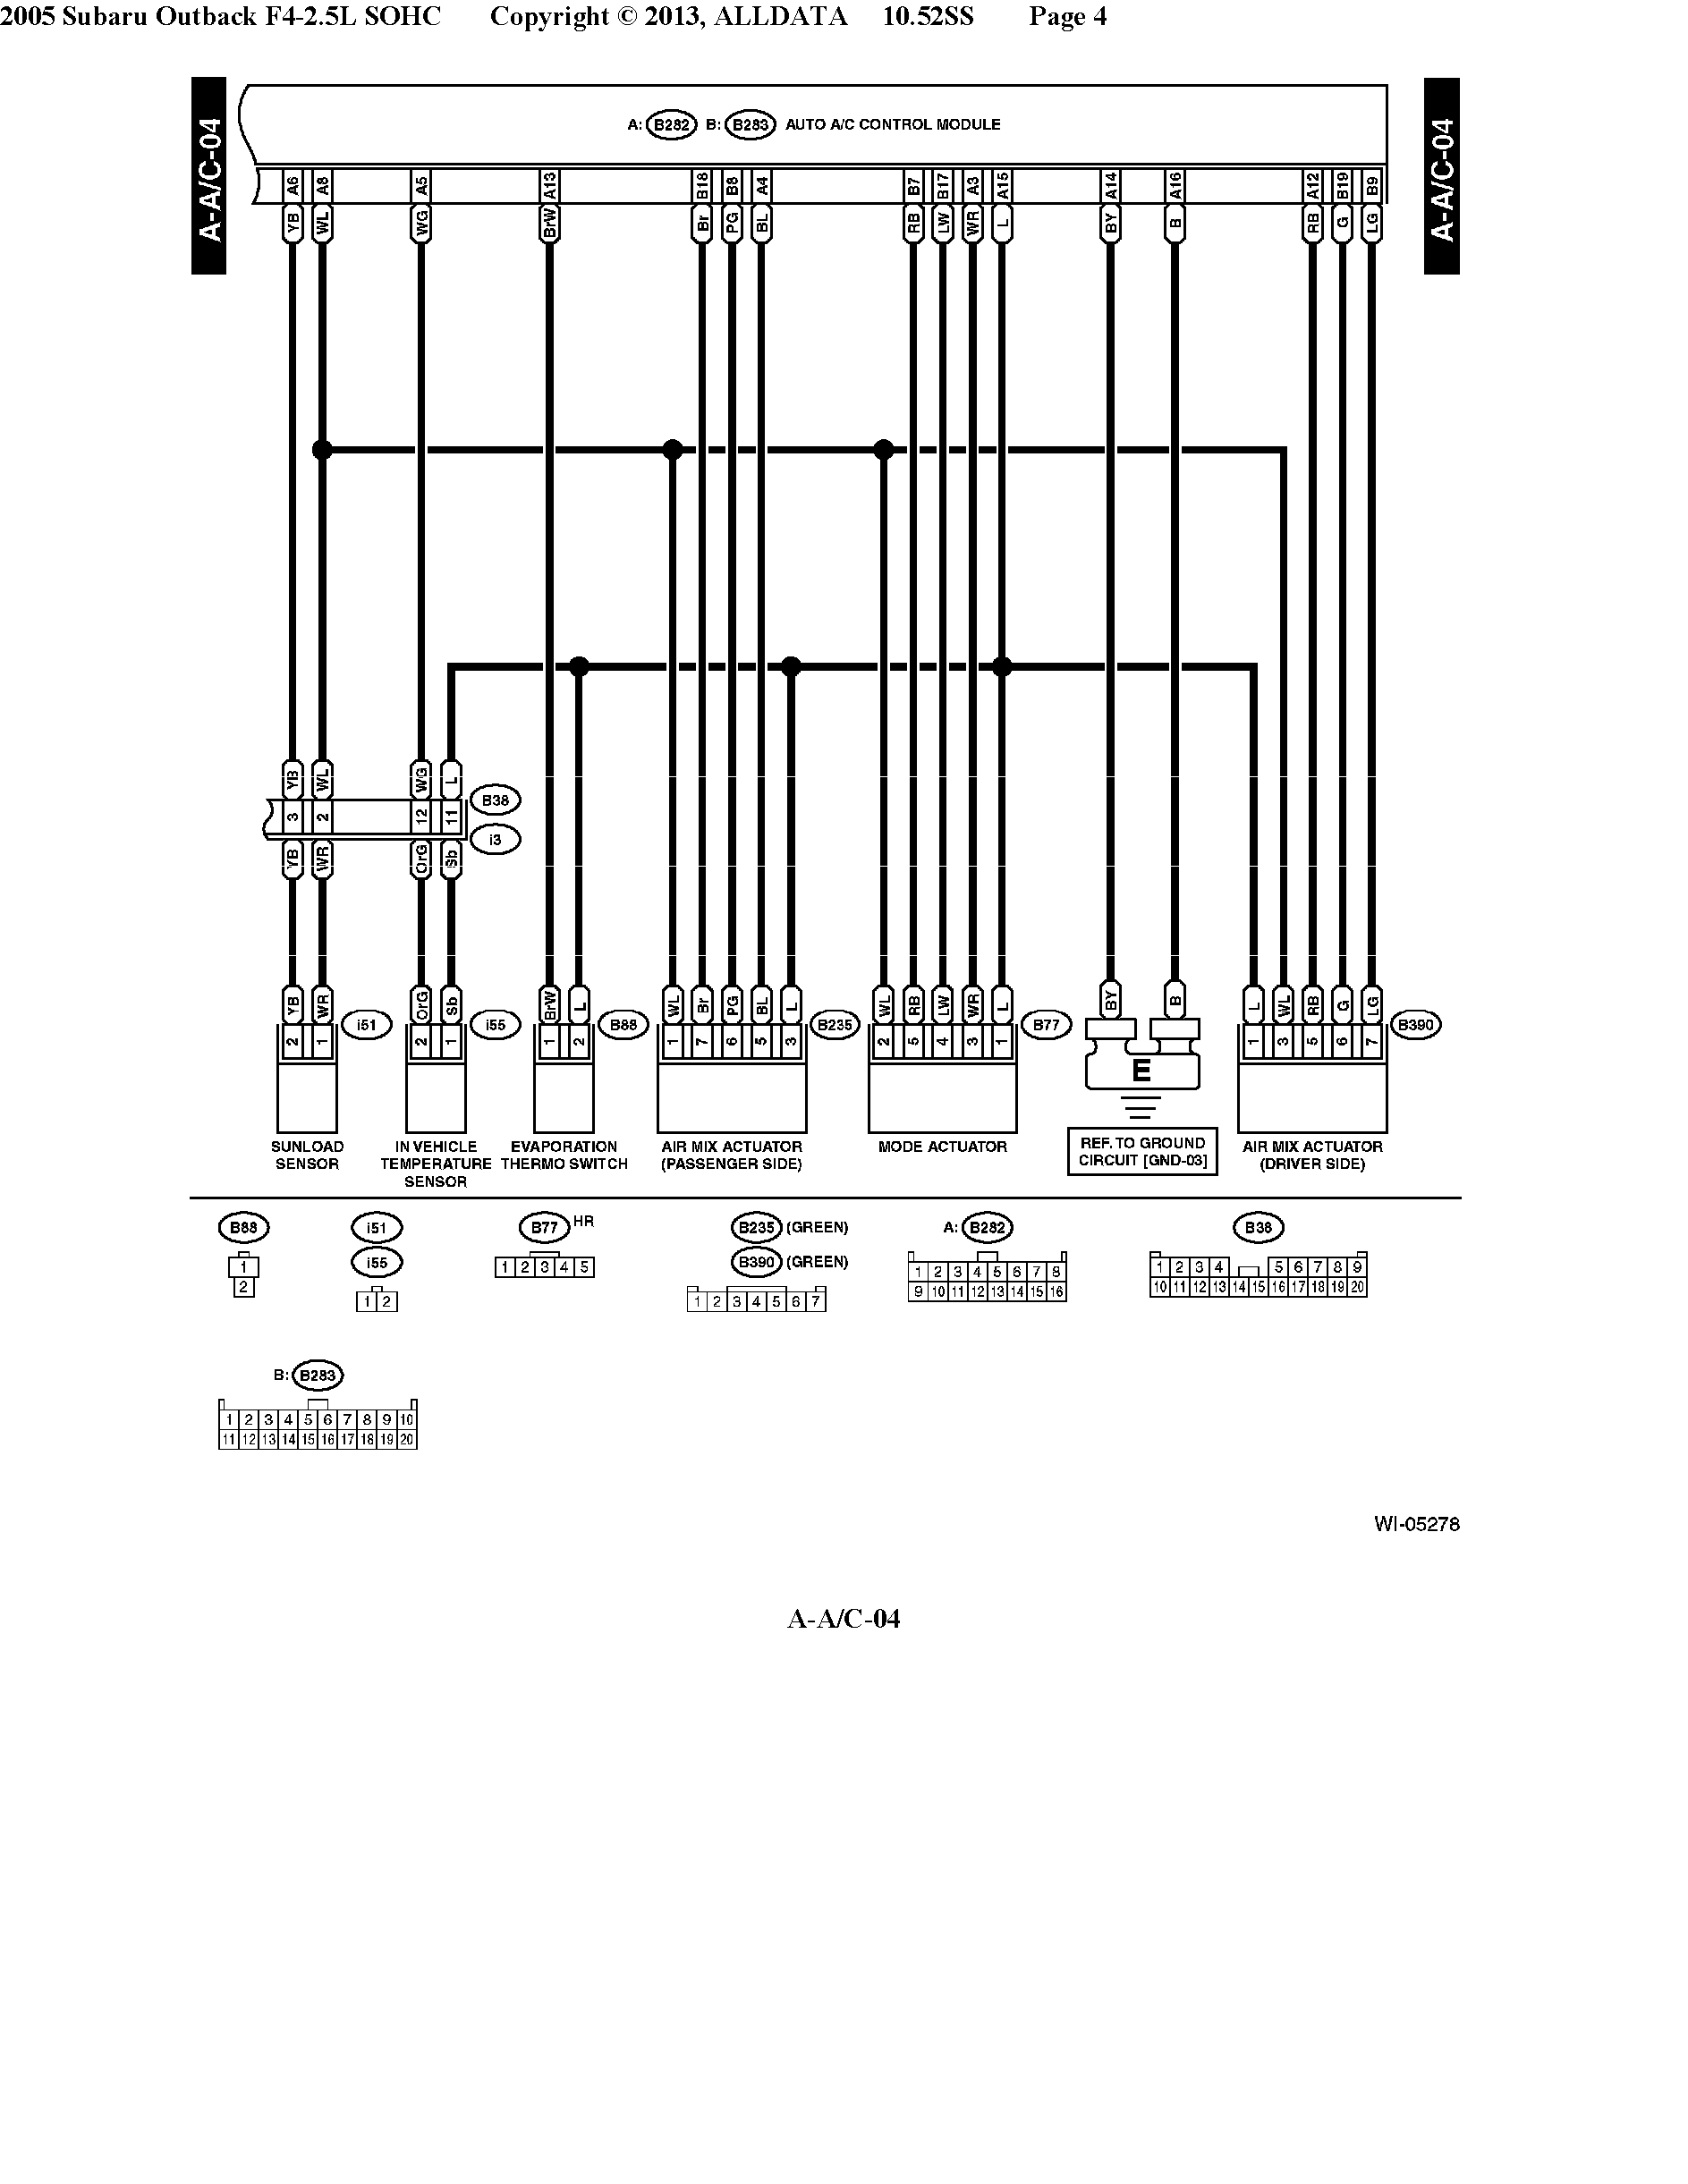 2007 Subaru Outback Relay Diagram Schematics Parts 05 H6 A C Compressor Cluth Not Getting 12v